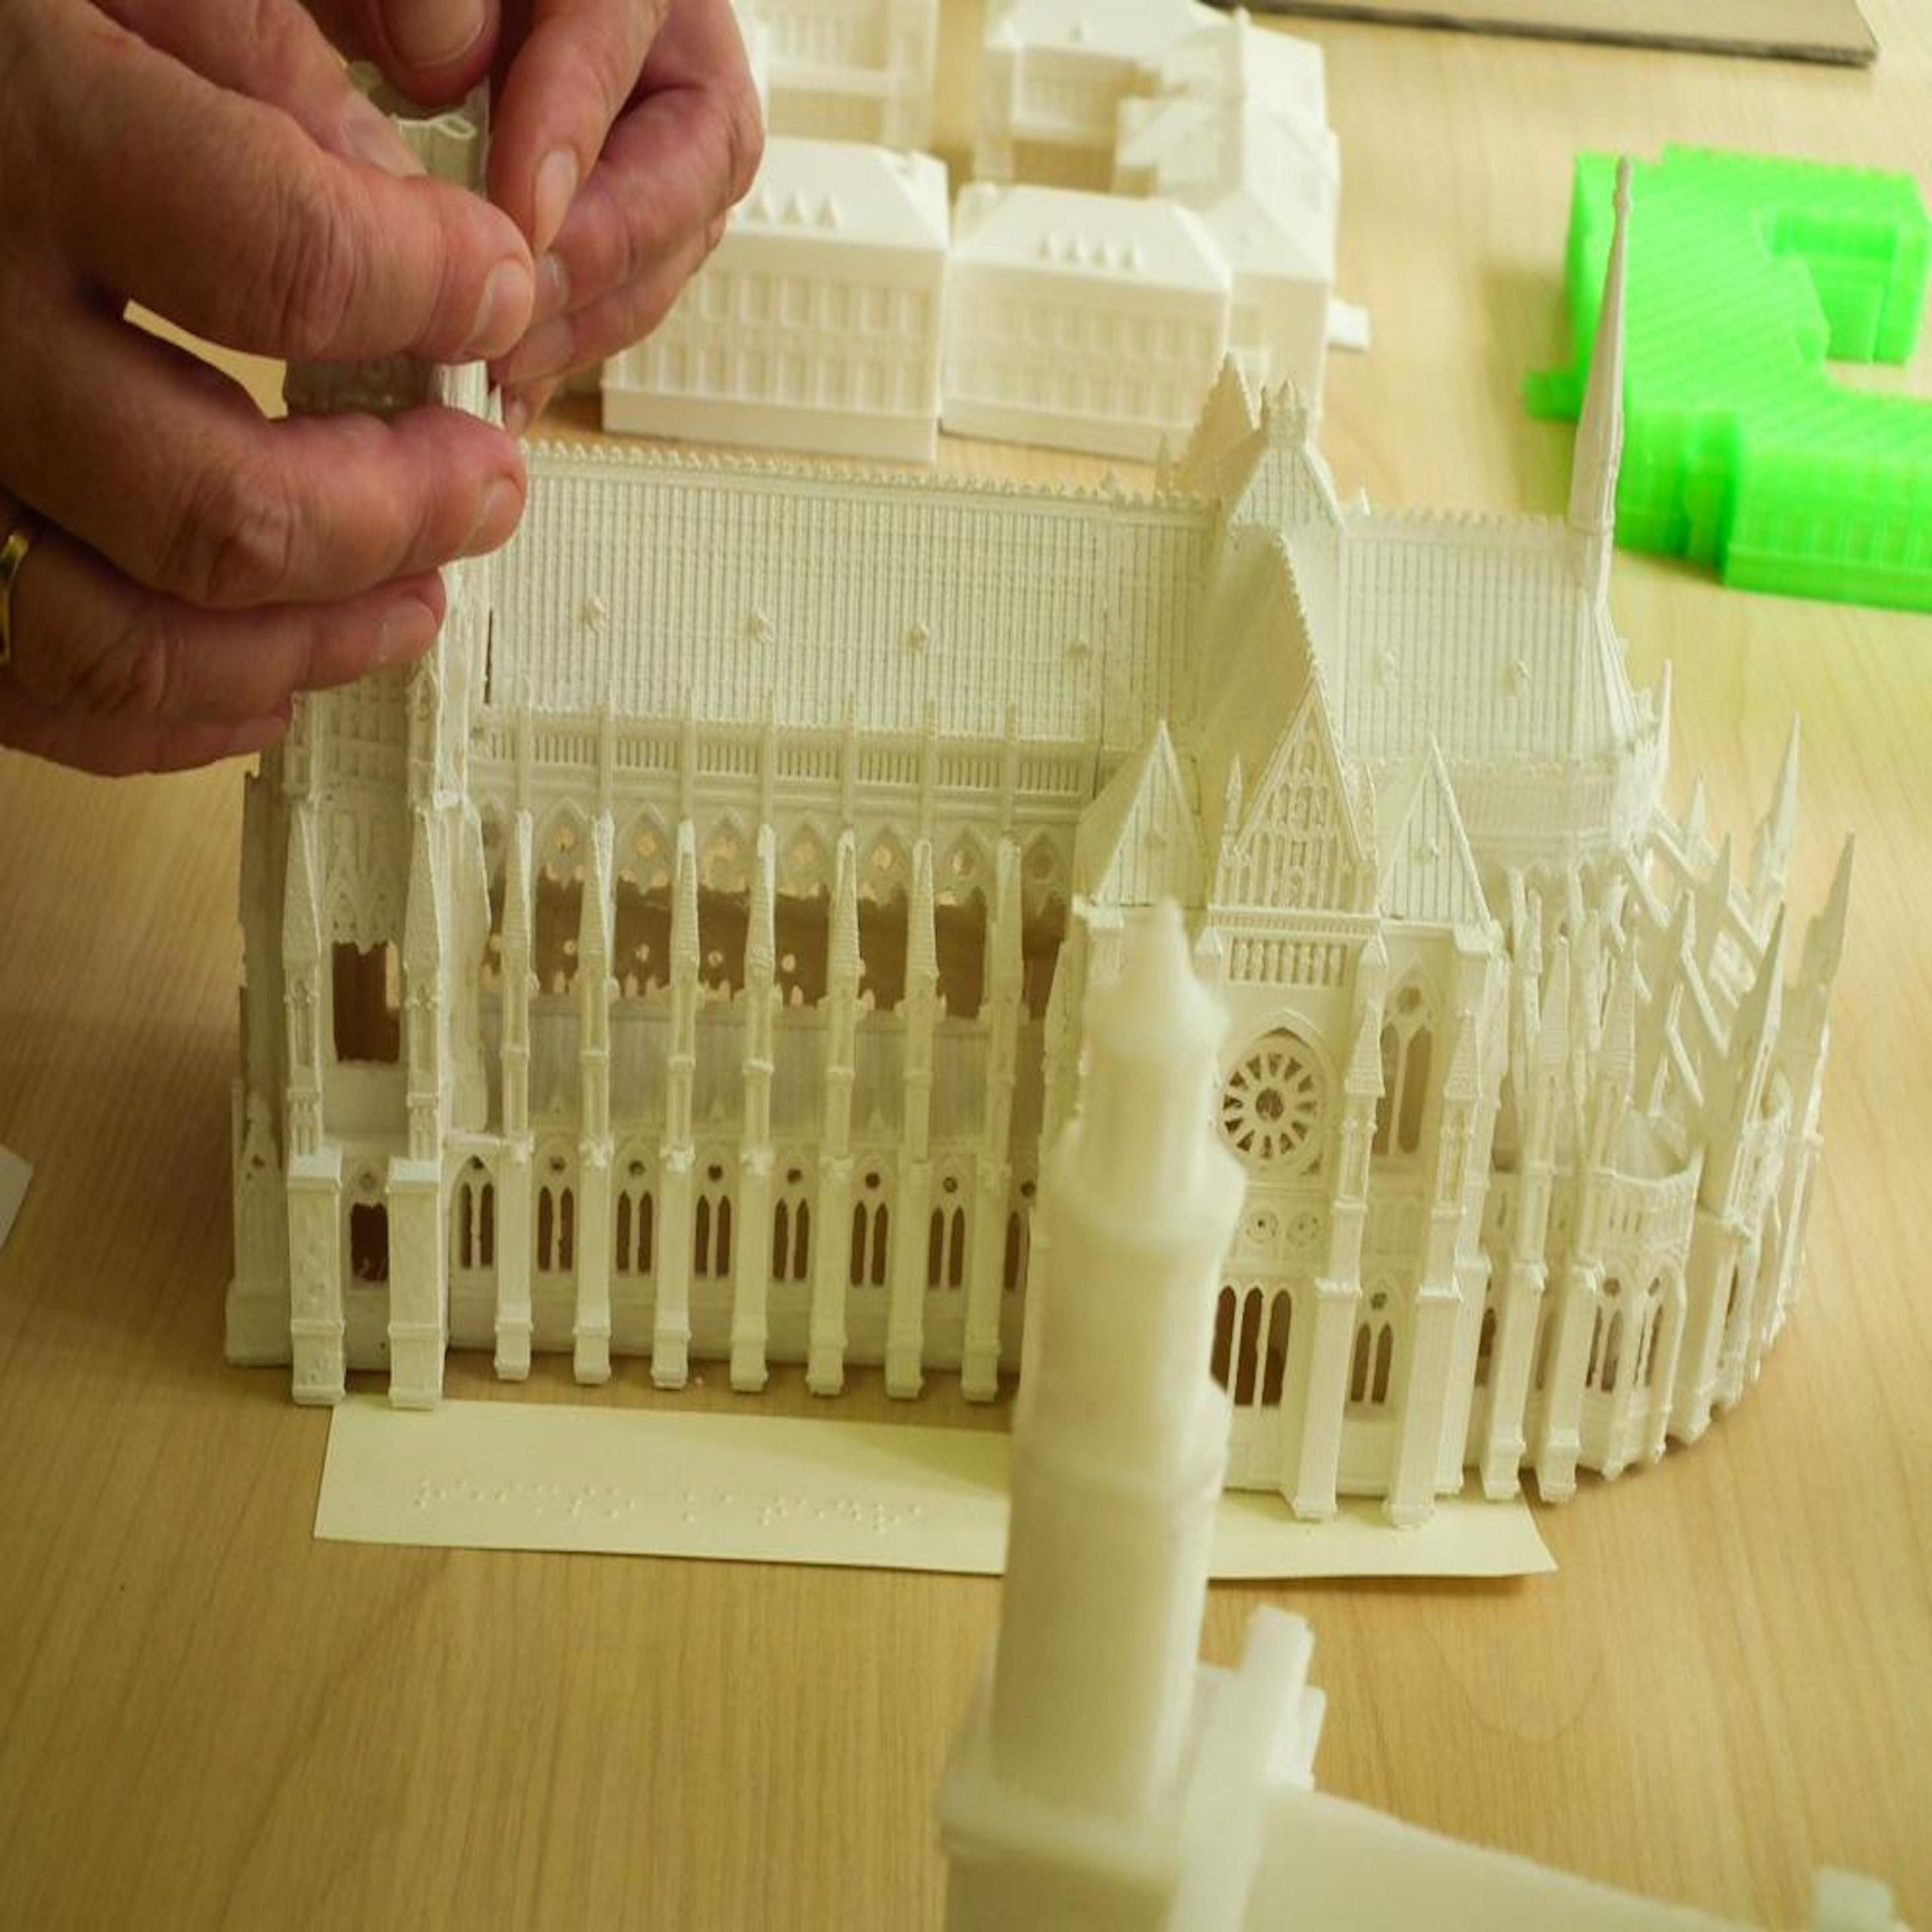 Apple Co-founder Steve Wozniak & Other Celebrities / Landmarks Are 3D Printed As Tactile Models For the Blind